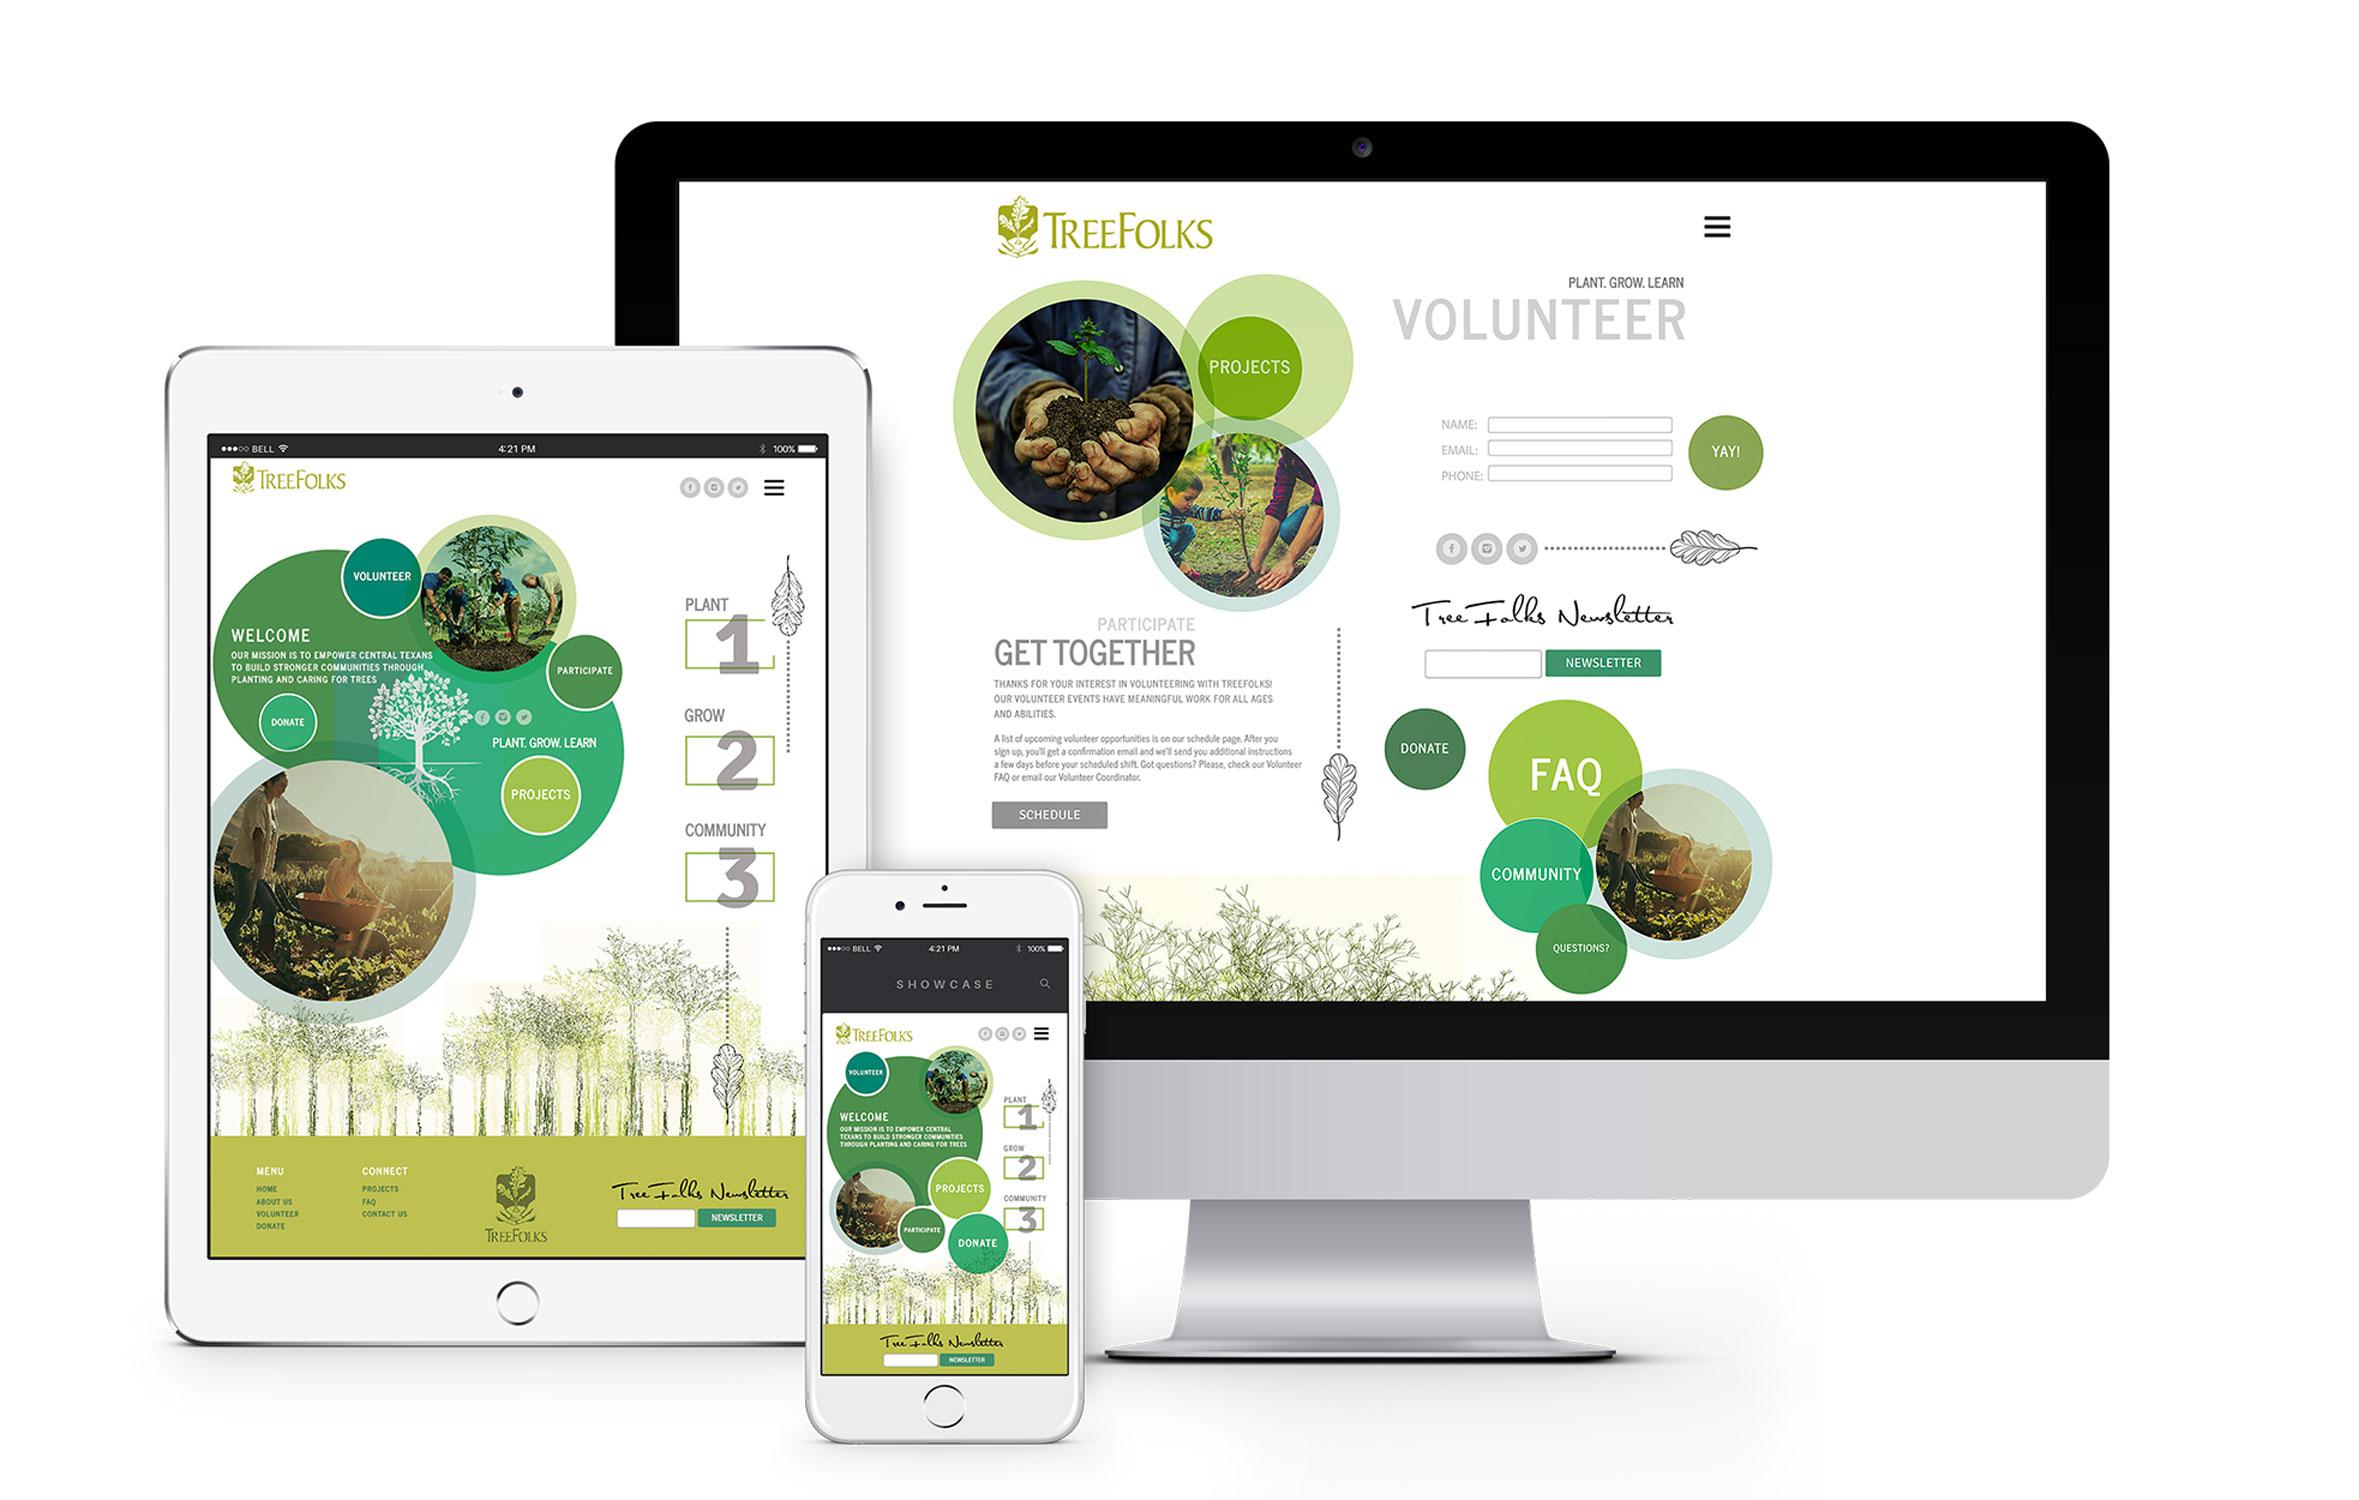 Devices-Presentation-Treefolks.jpg